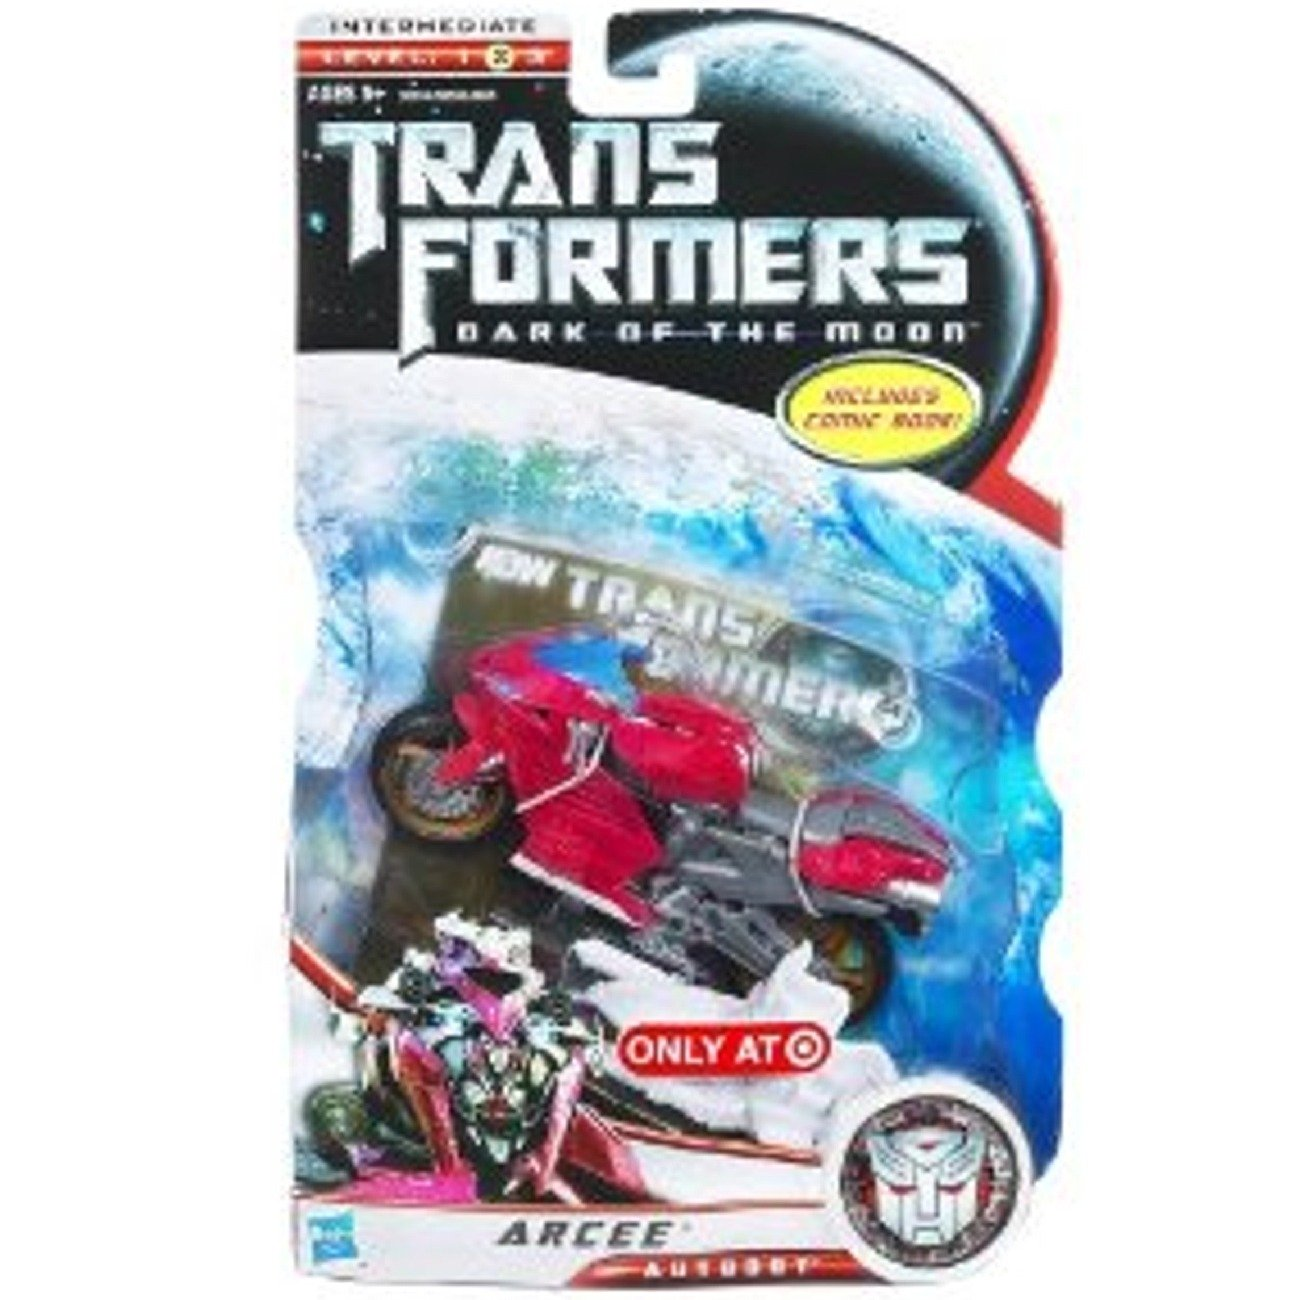 Transformers Dark ot the Moon Autobot Acree inkl. Comic Buch jetzt kaufen